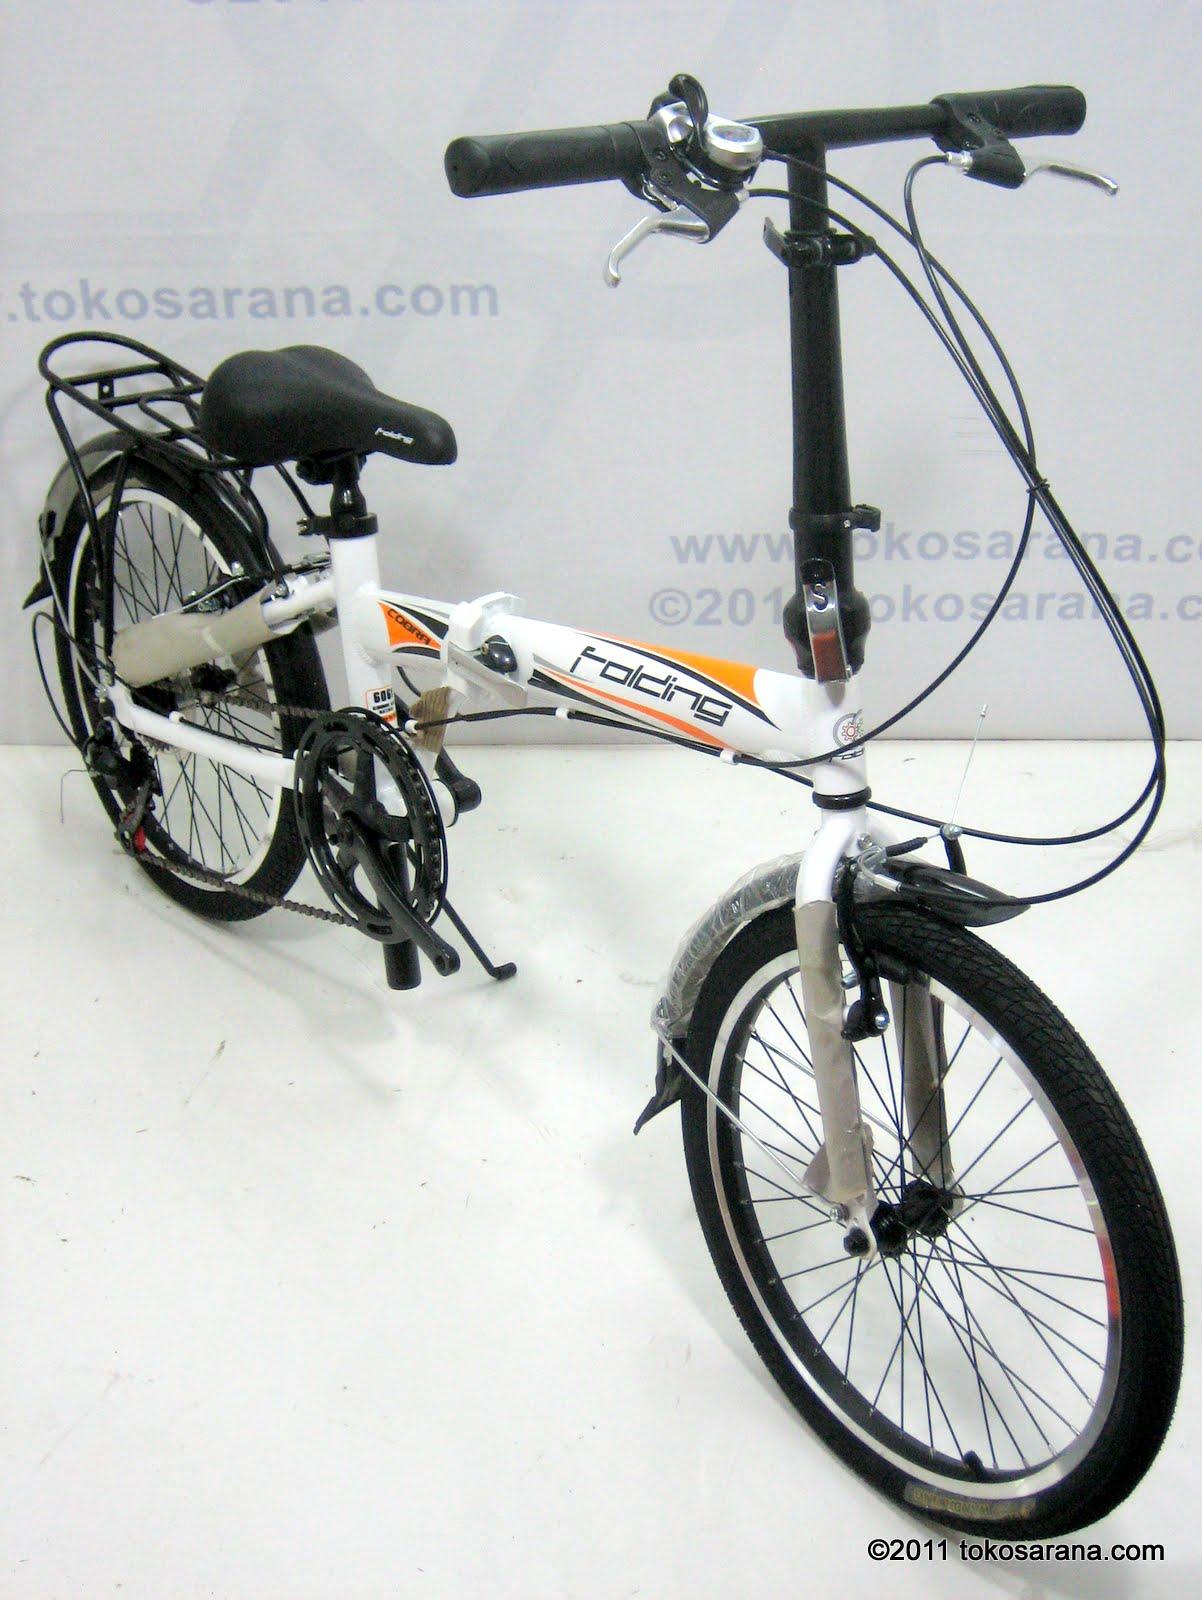 tokomagenta: A Showcase of Products: Sepeda Lipat ELEMENT